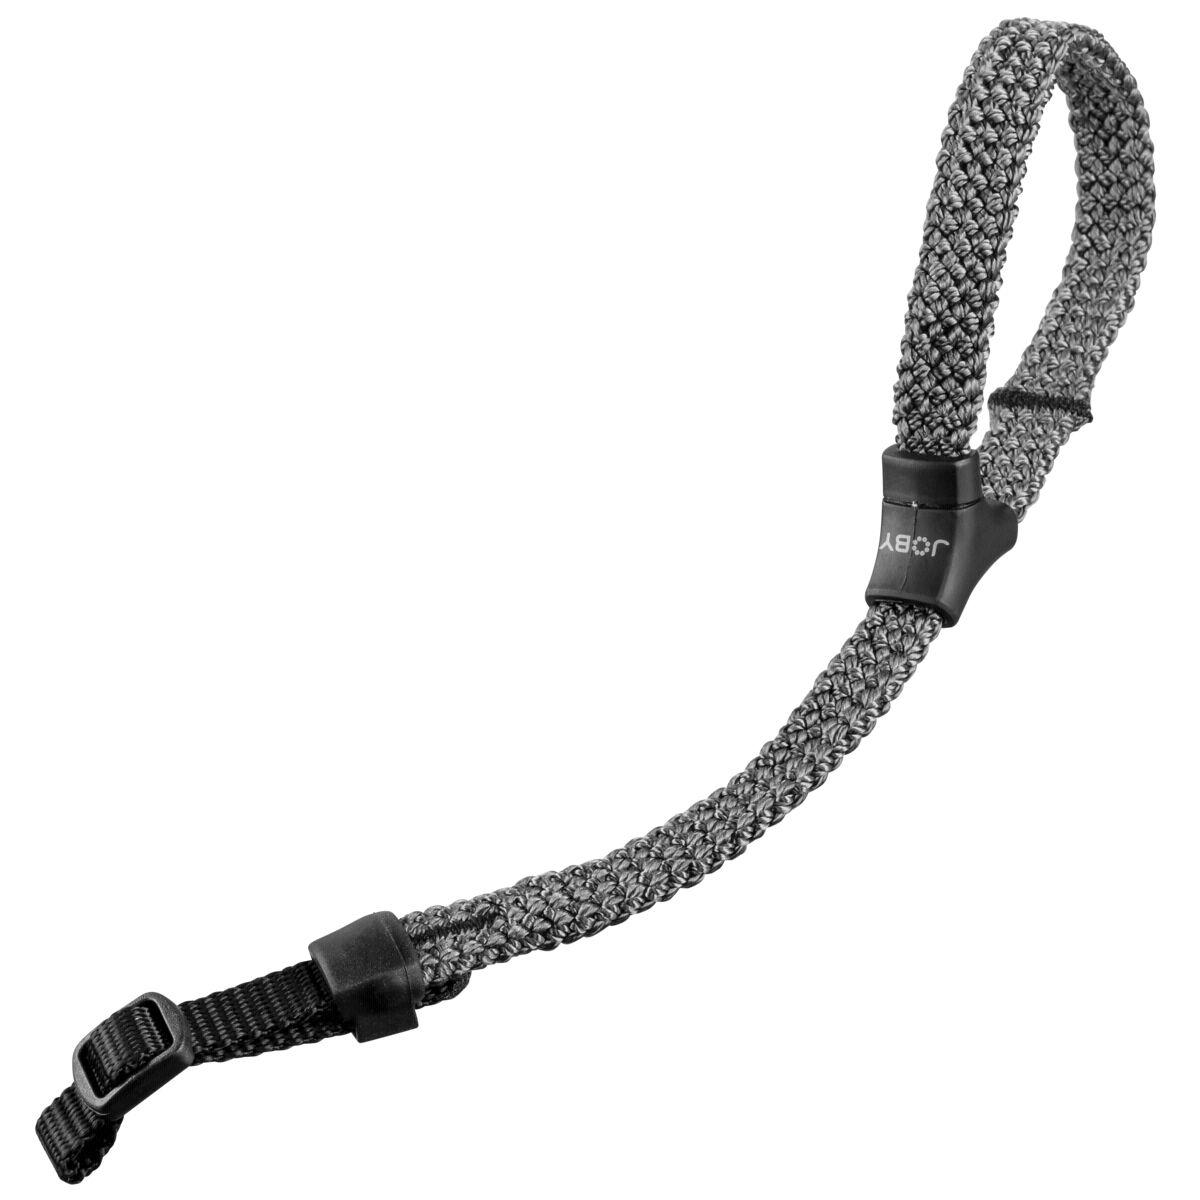 Joby Handschlaufe »DSLR Wrist Strap dunkel«